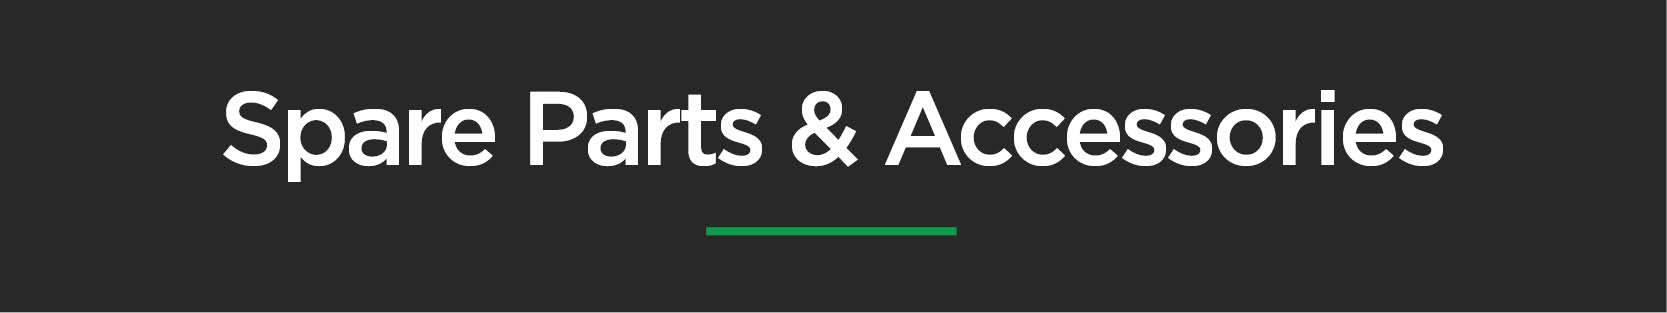 Spare-Parts & Accessories